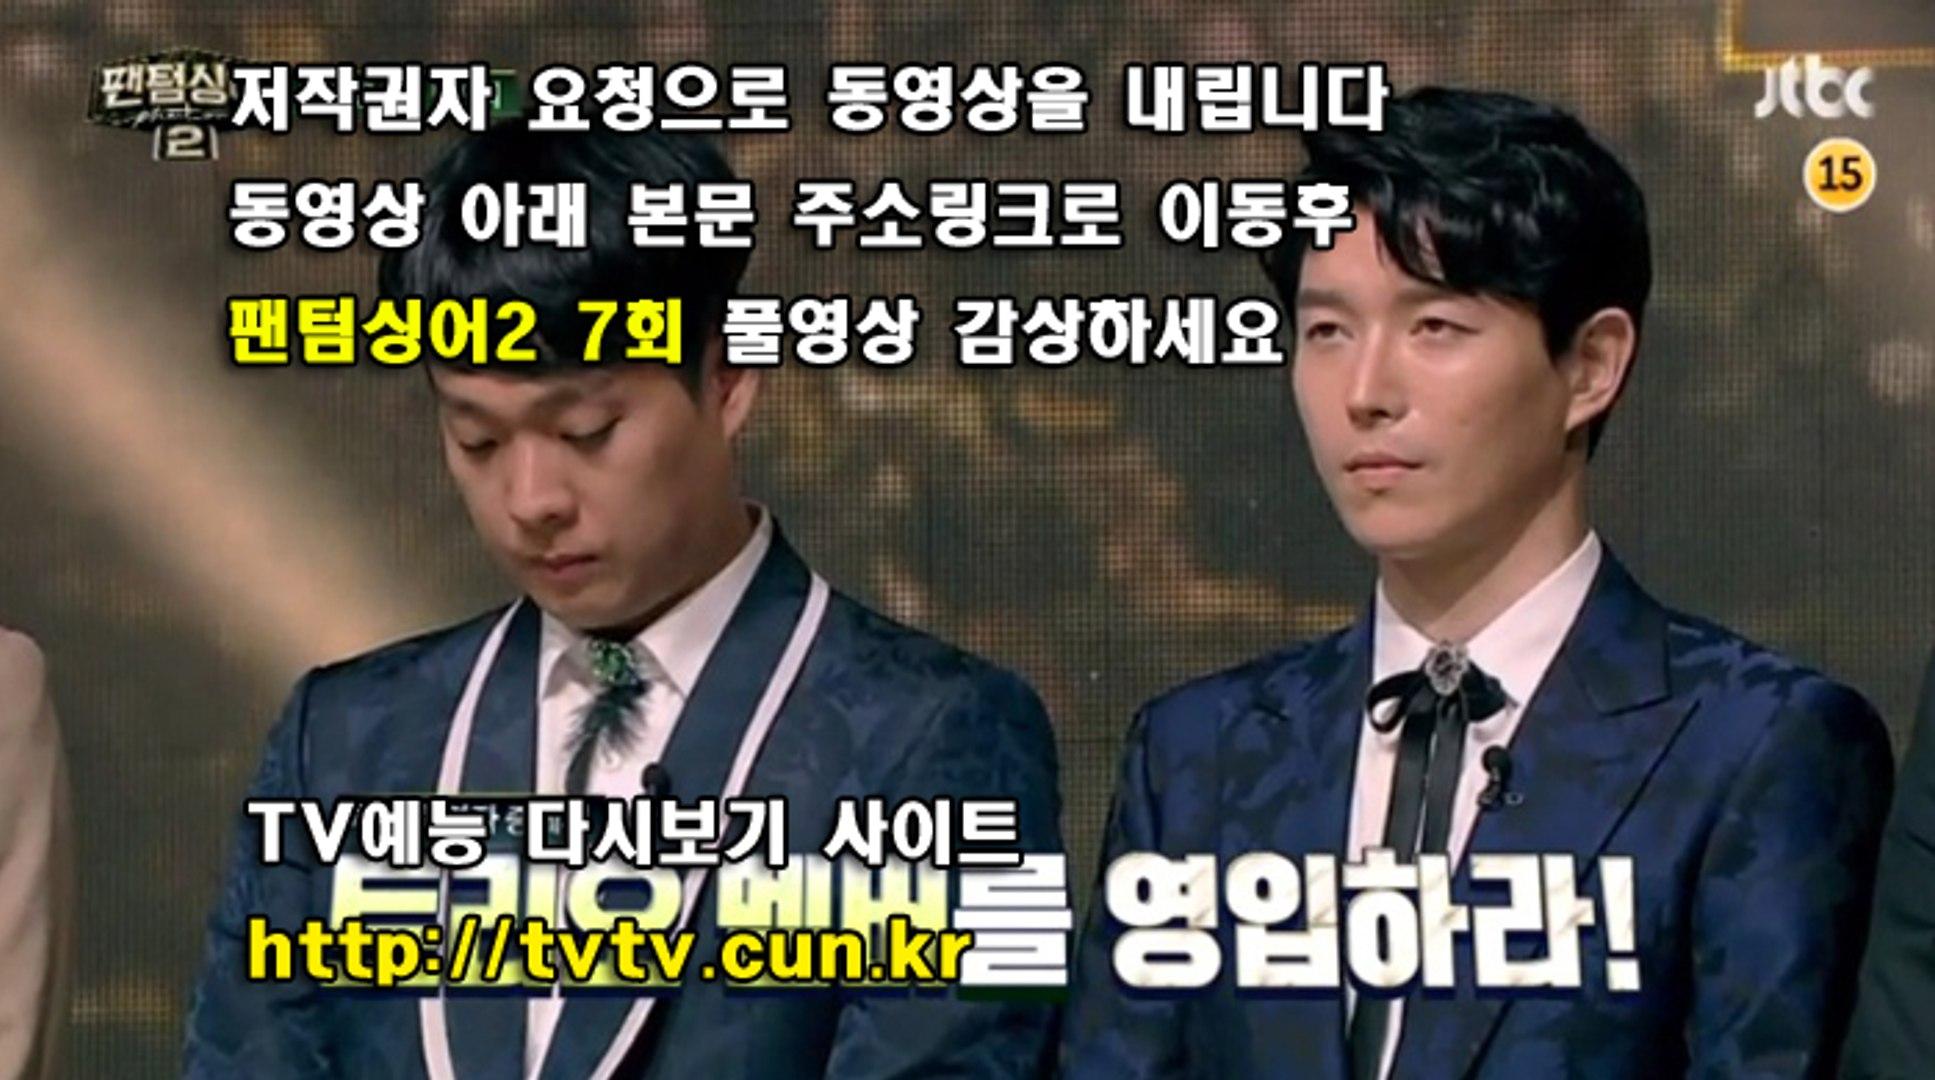 JTBC-팬텀싱어2 7회 다시보기-팬텀싱어 시즌2 7화-다시보기-팬텀싱어2.E07.재방송